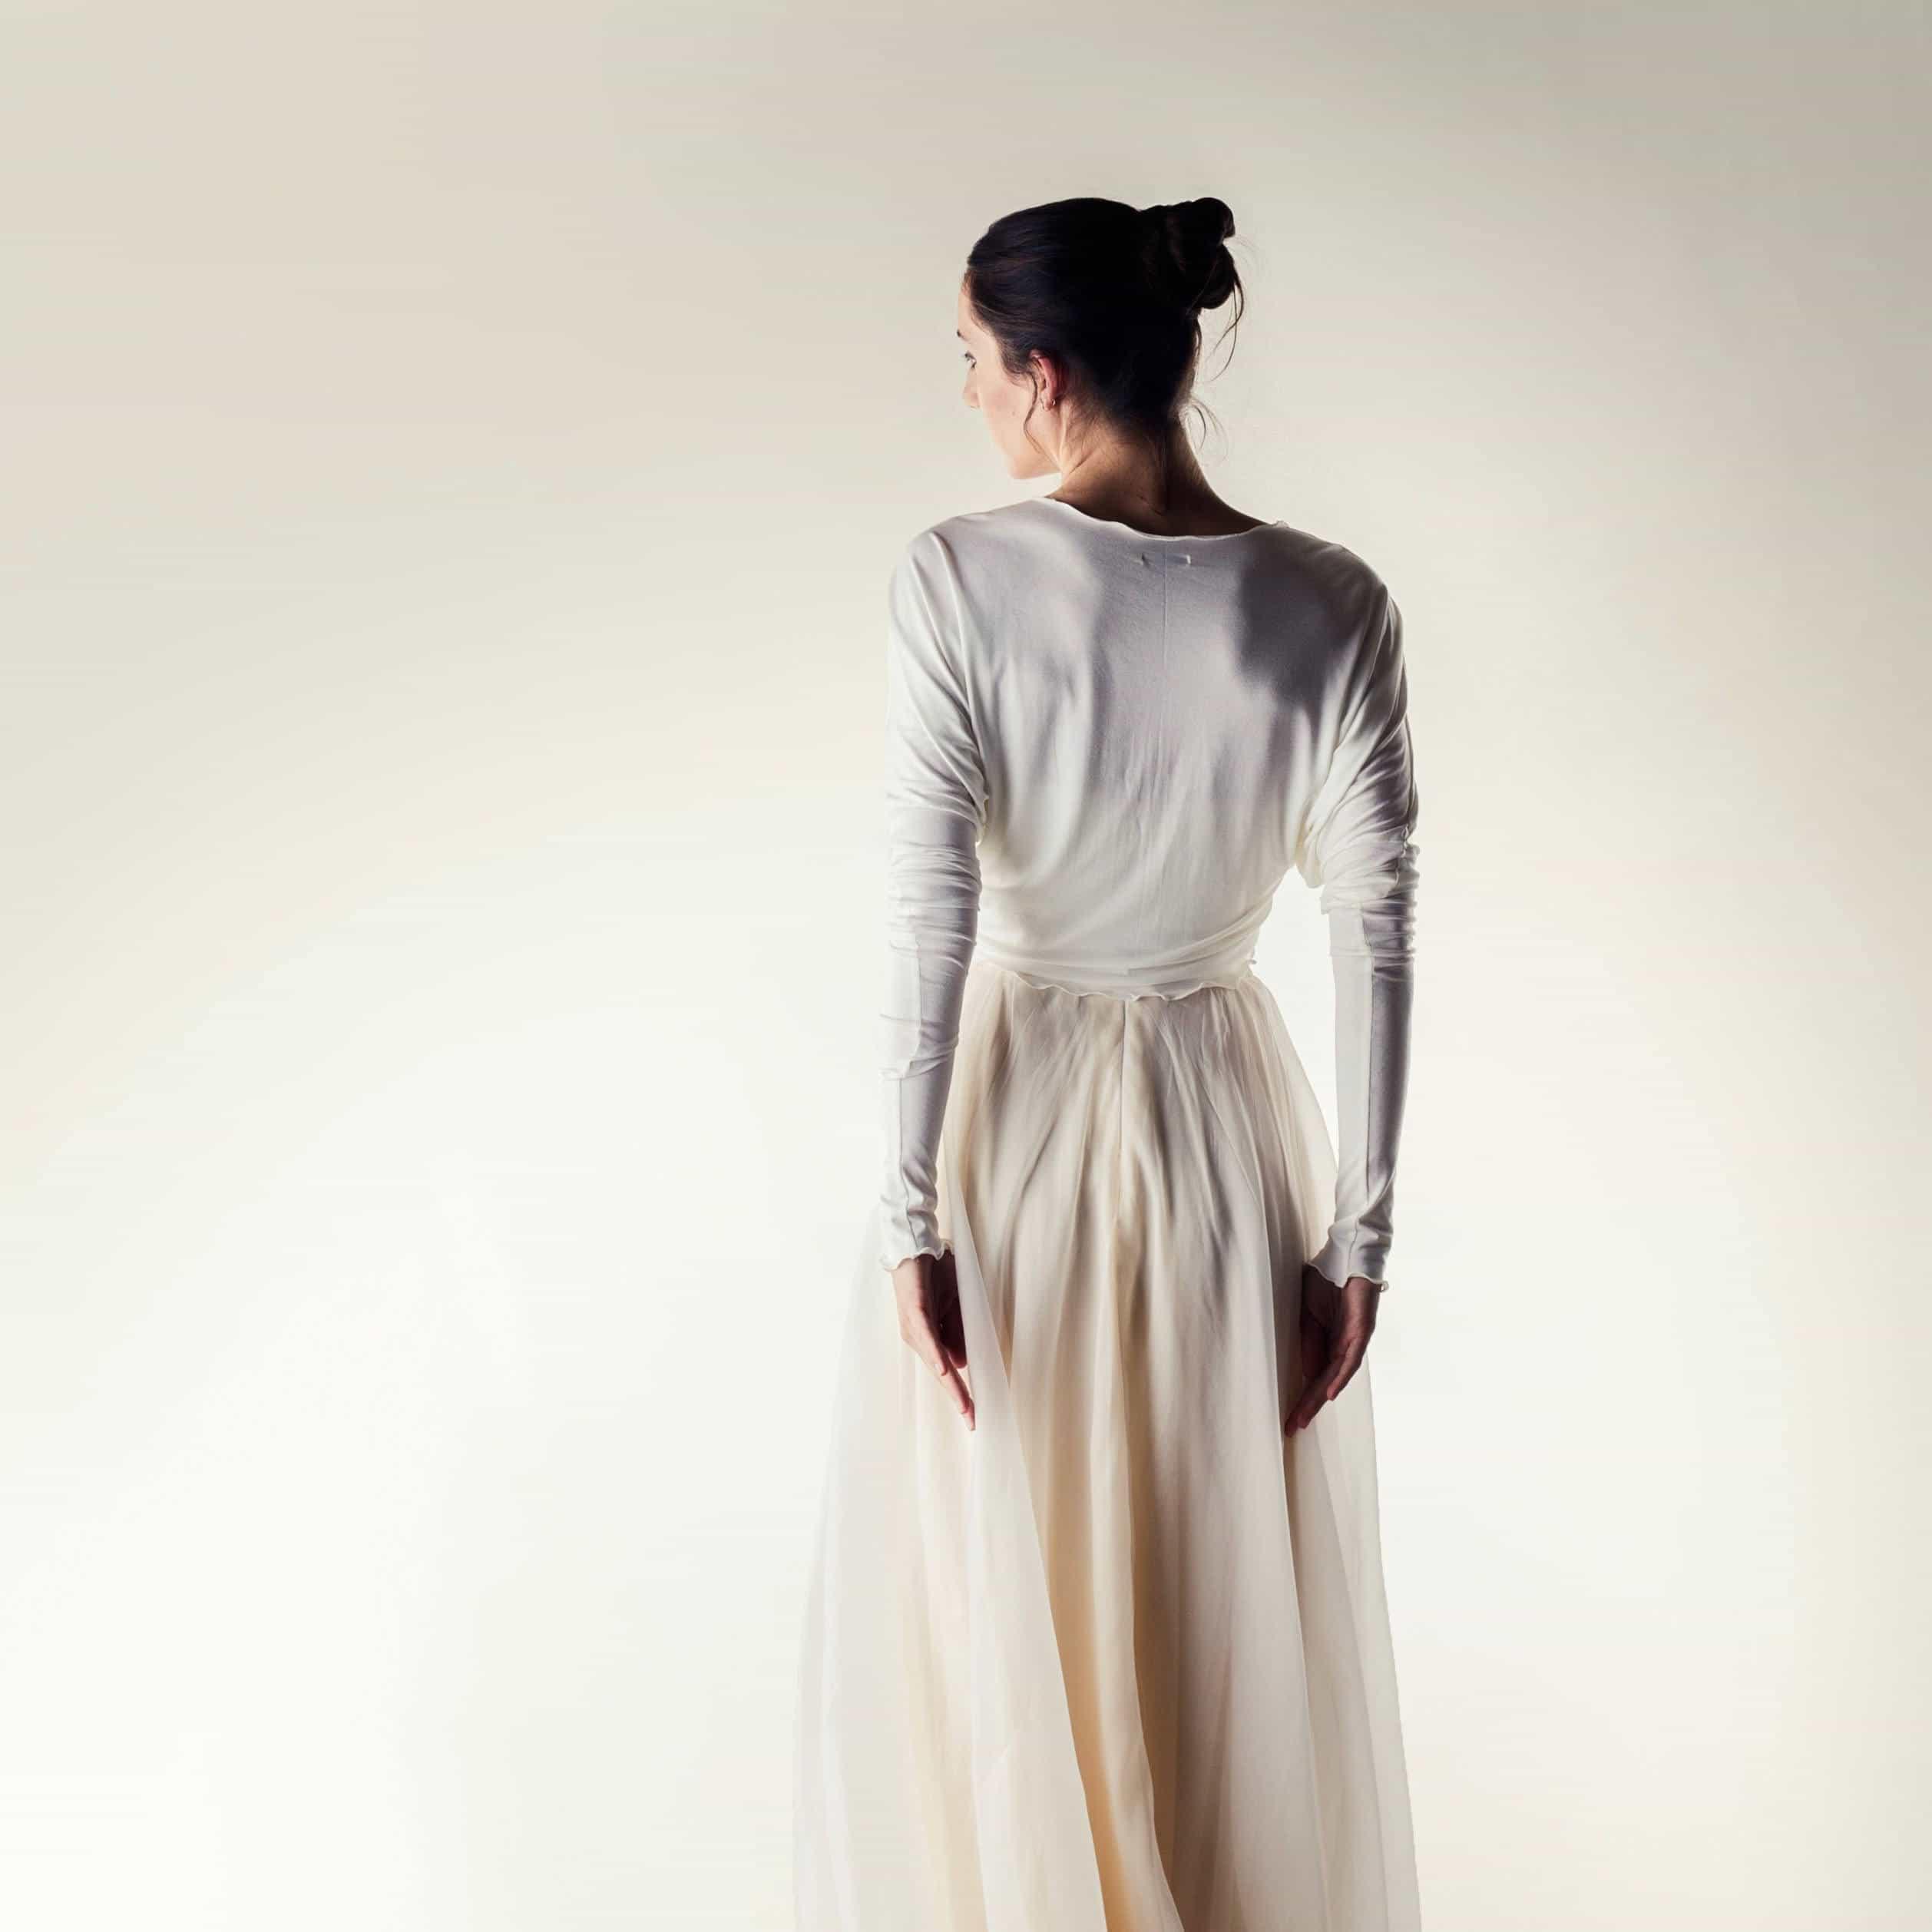 Long sleeve draped cardigan - Larimeloom handmade clothing